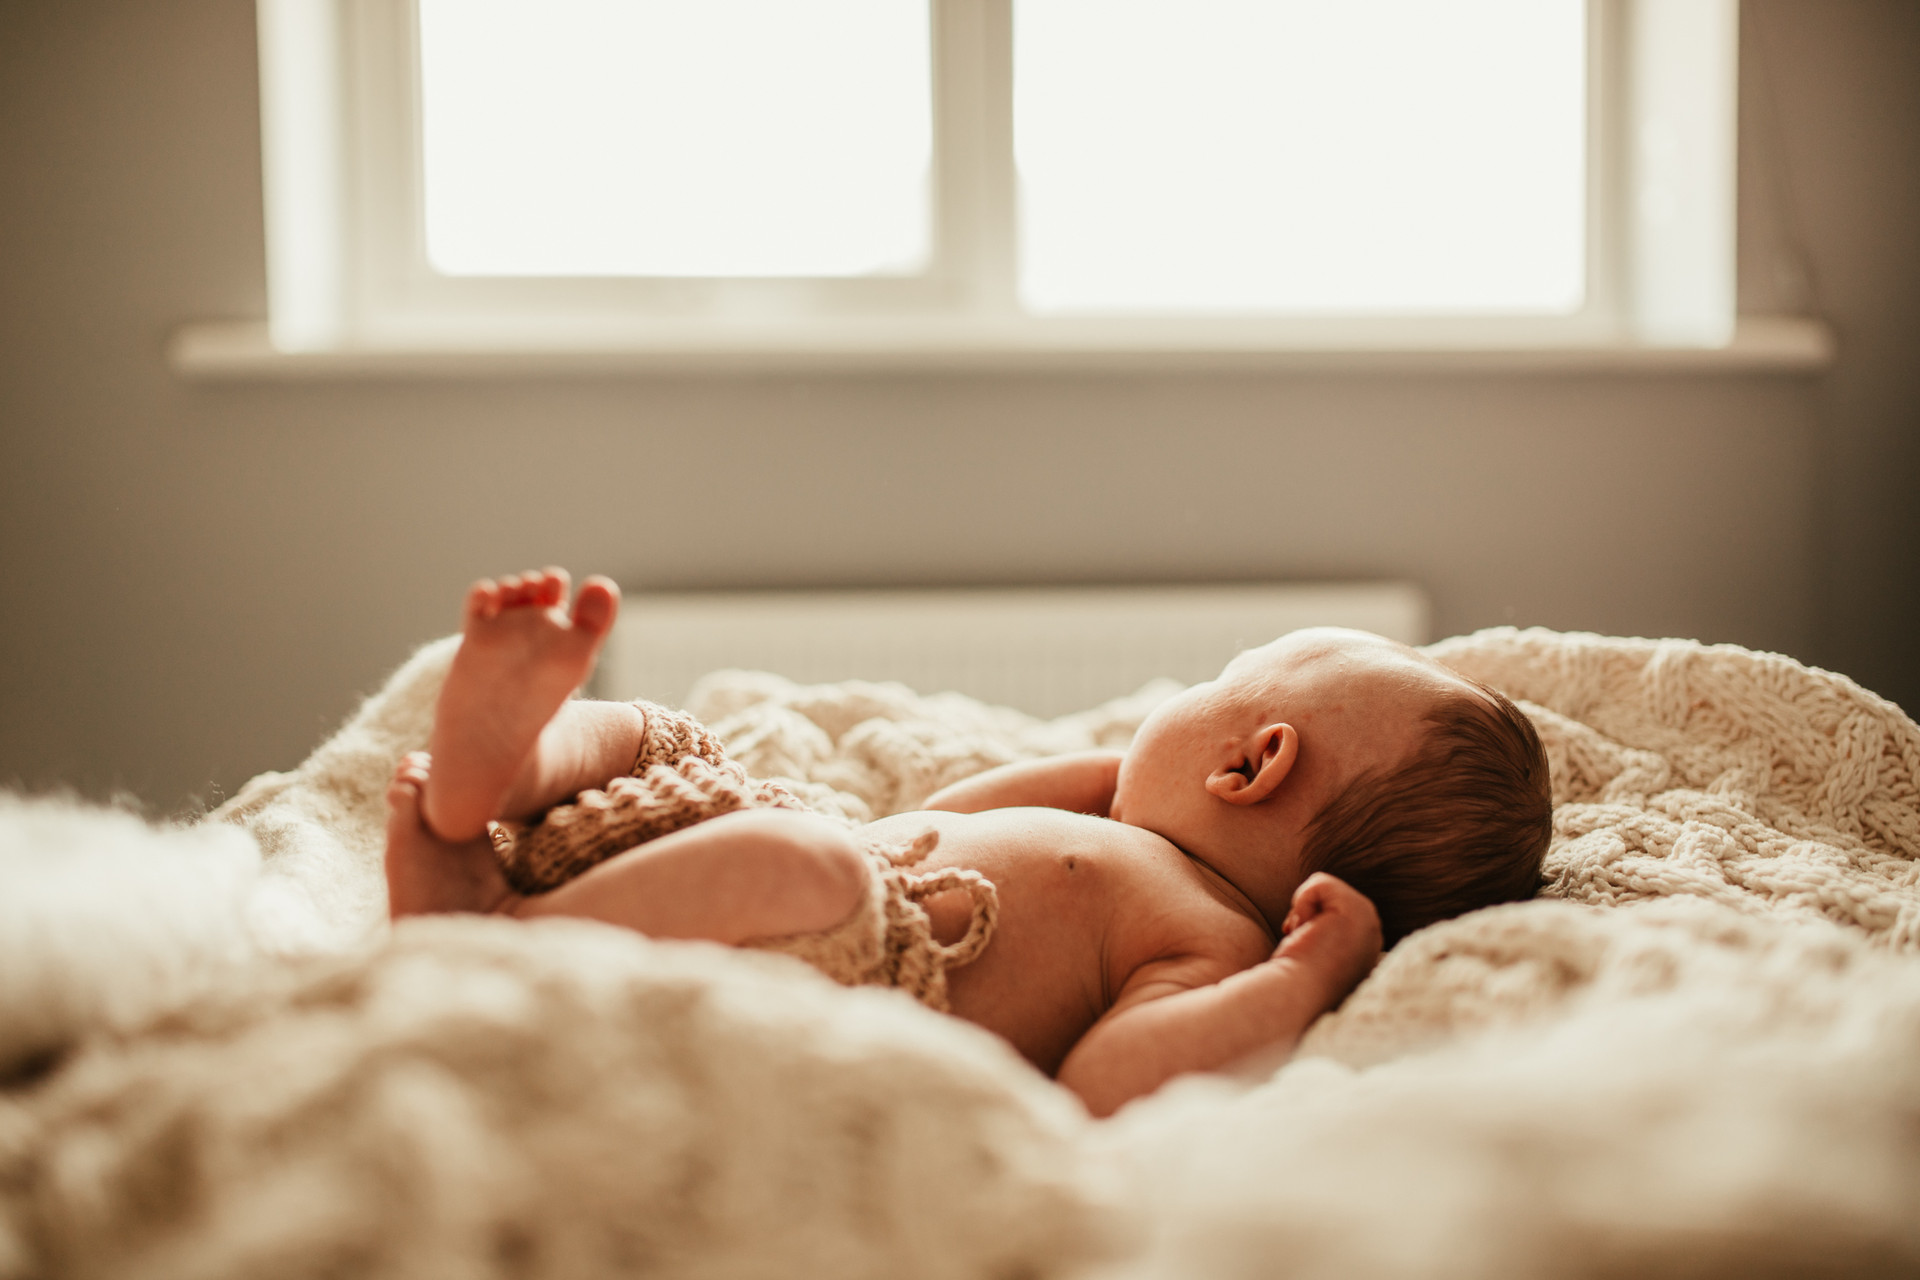 baby in the window light